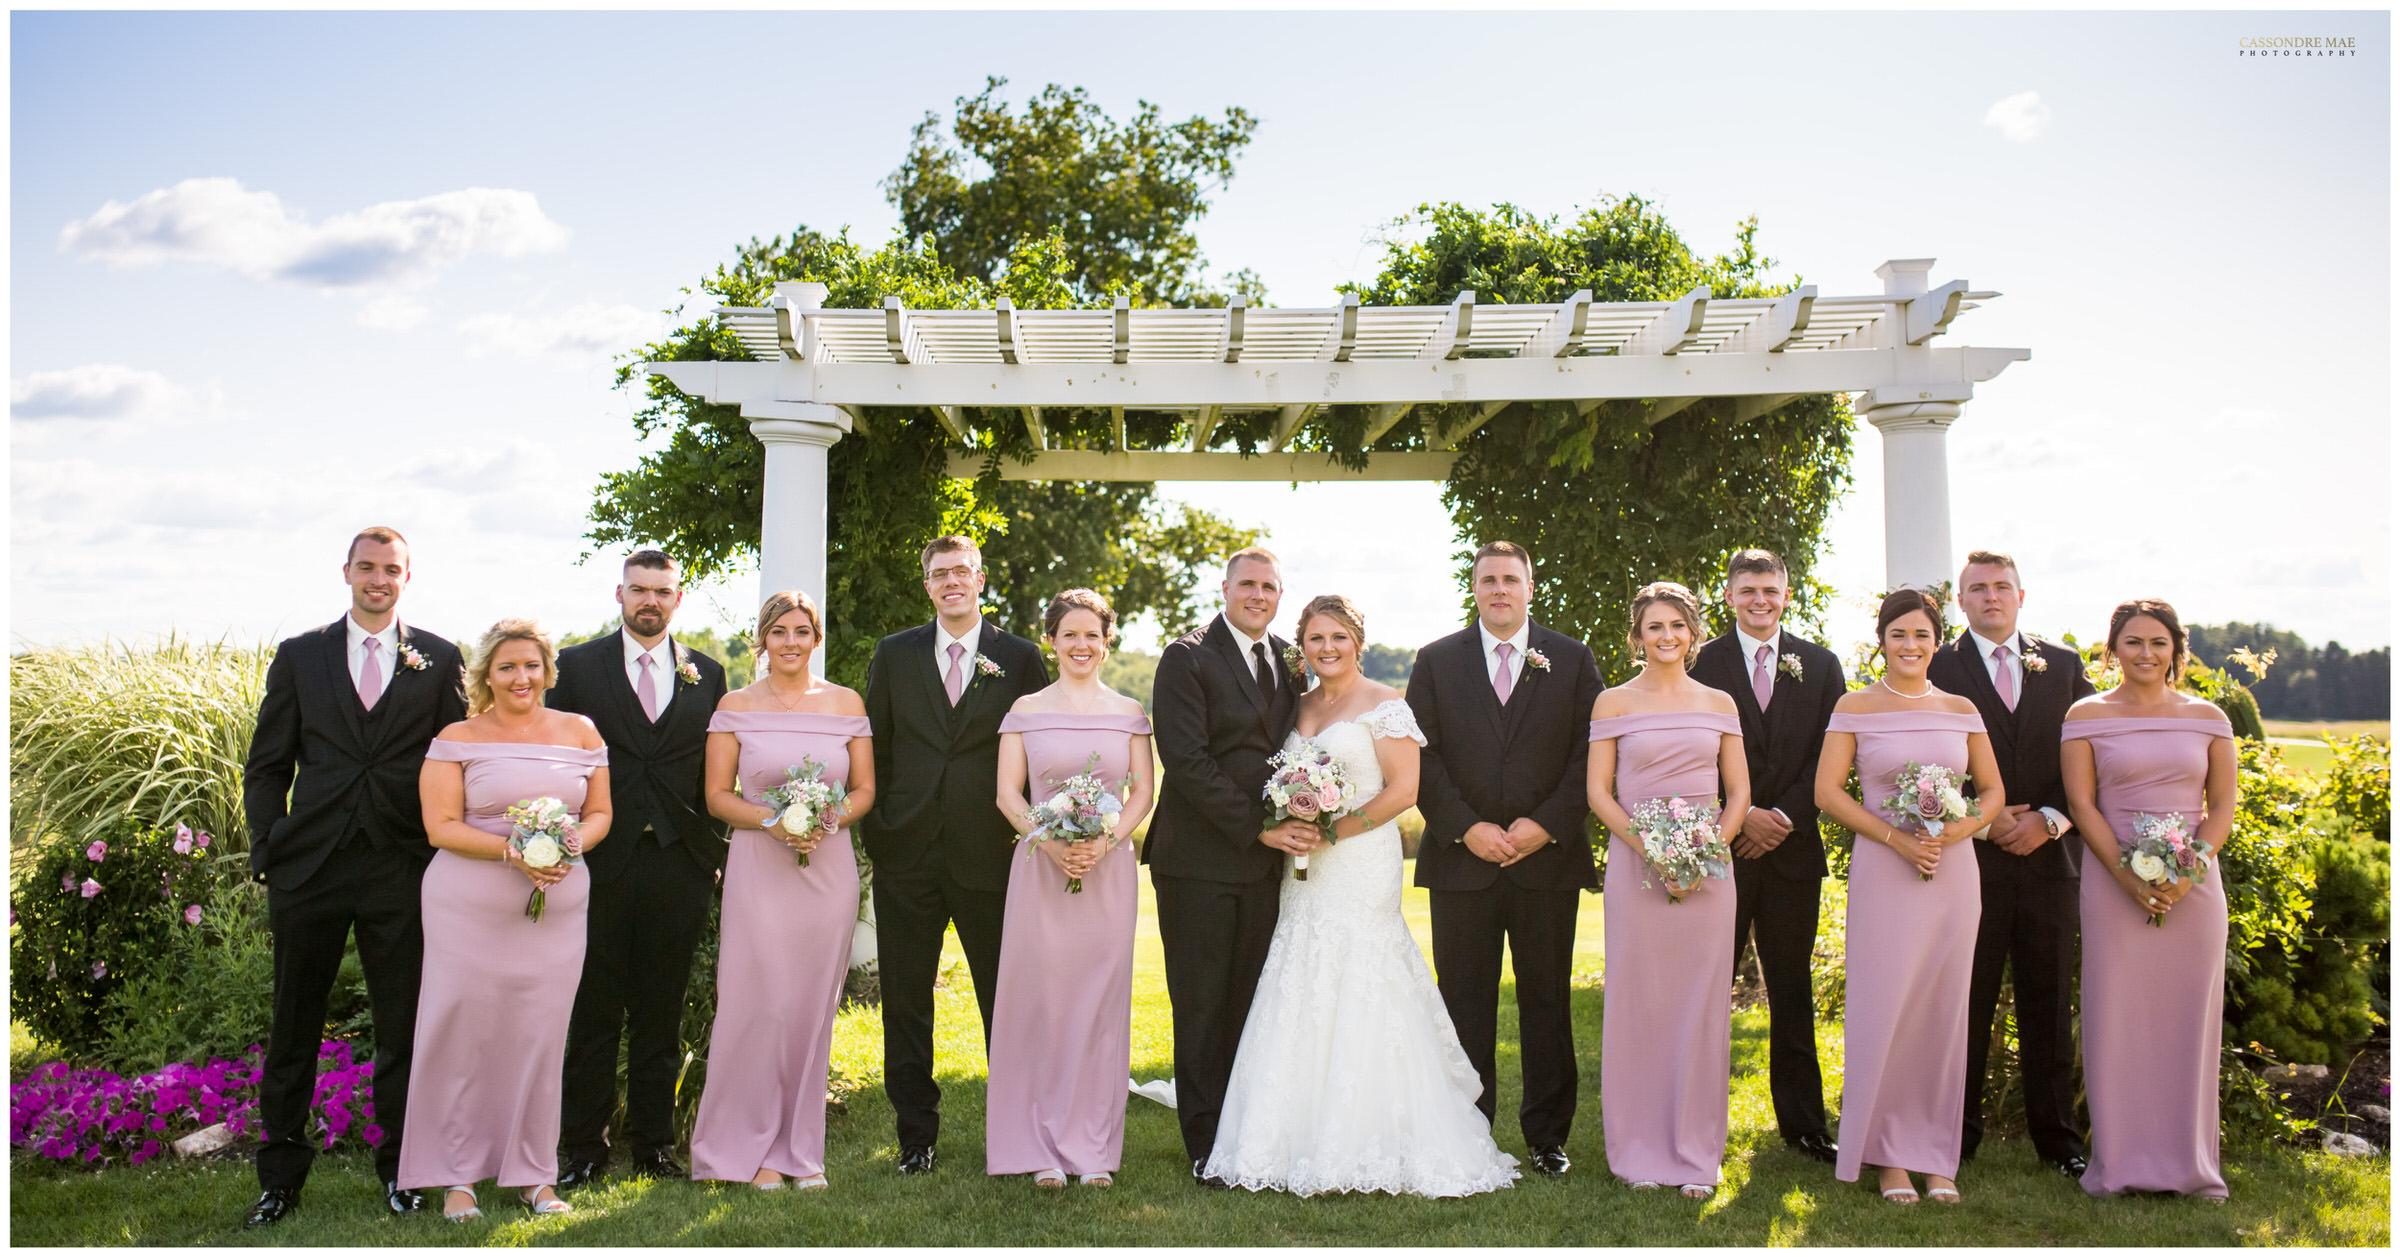 Cassondre Mae Photography The Links Wedding Photographer 13.jpg